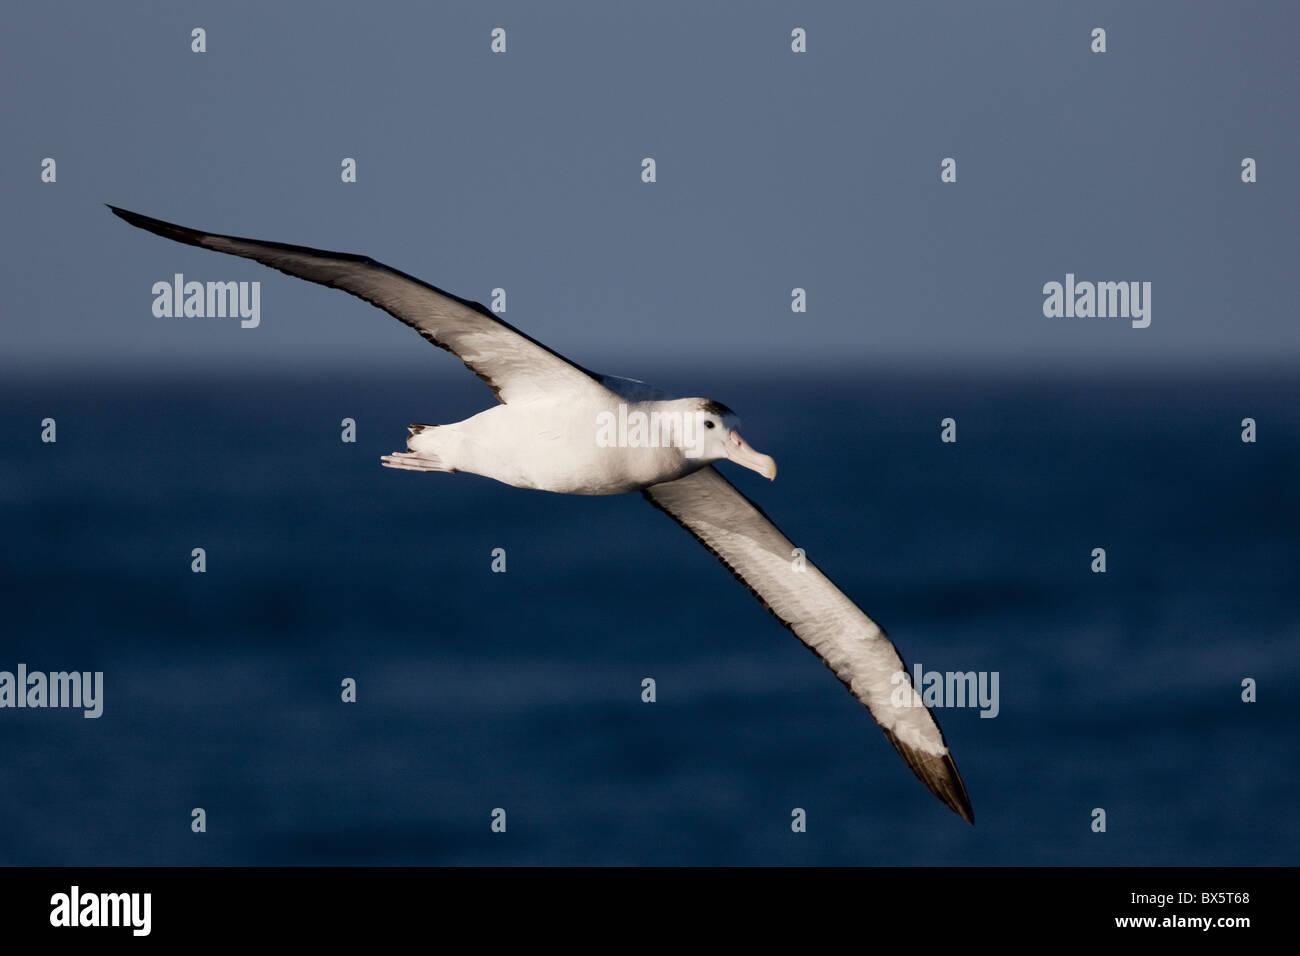 Wandering albatross (Diomedea exulans), Southern Ocean, Antarctic, Polar Regions - Stock Image